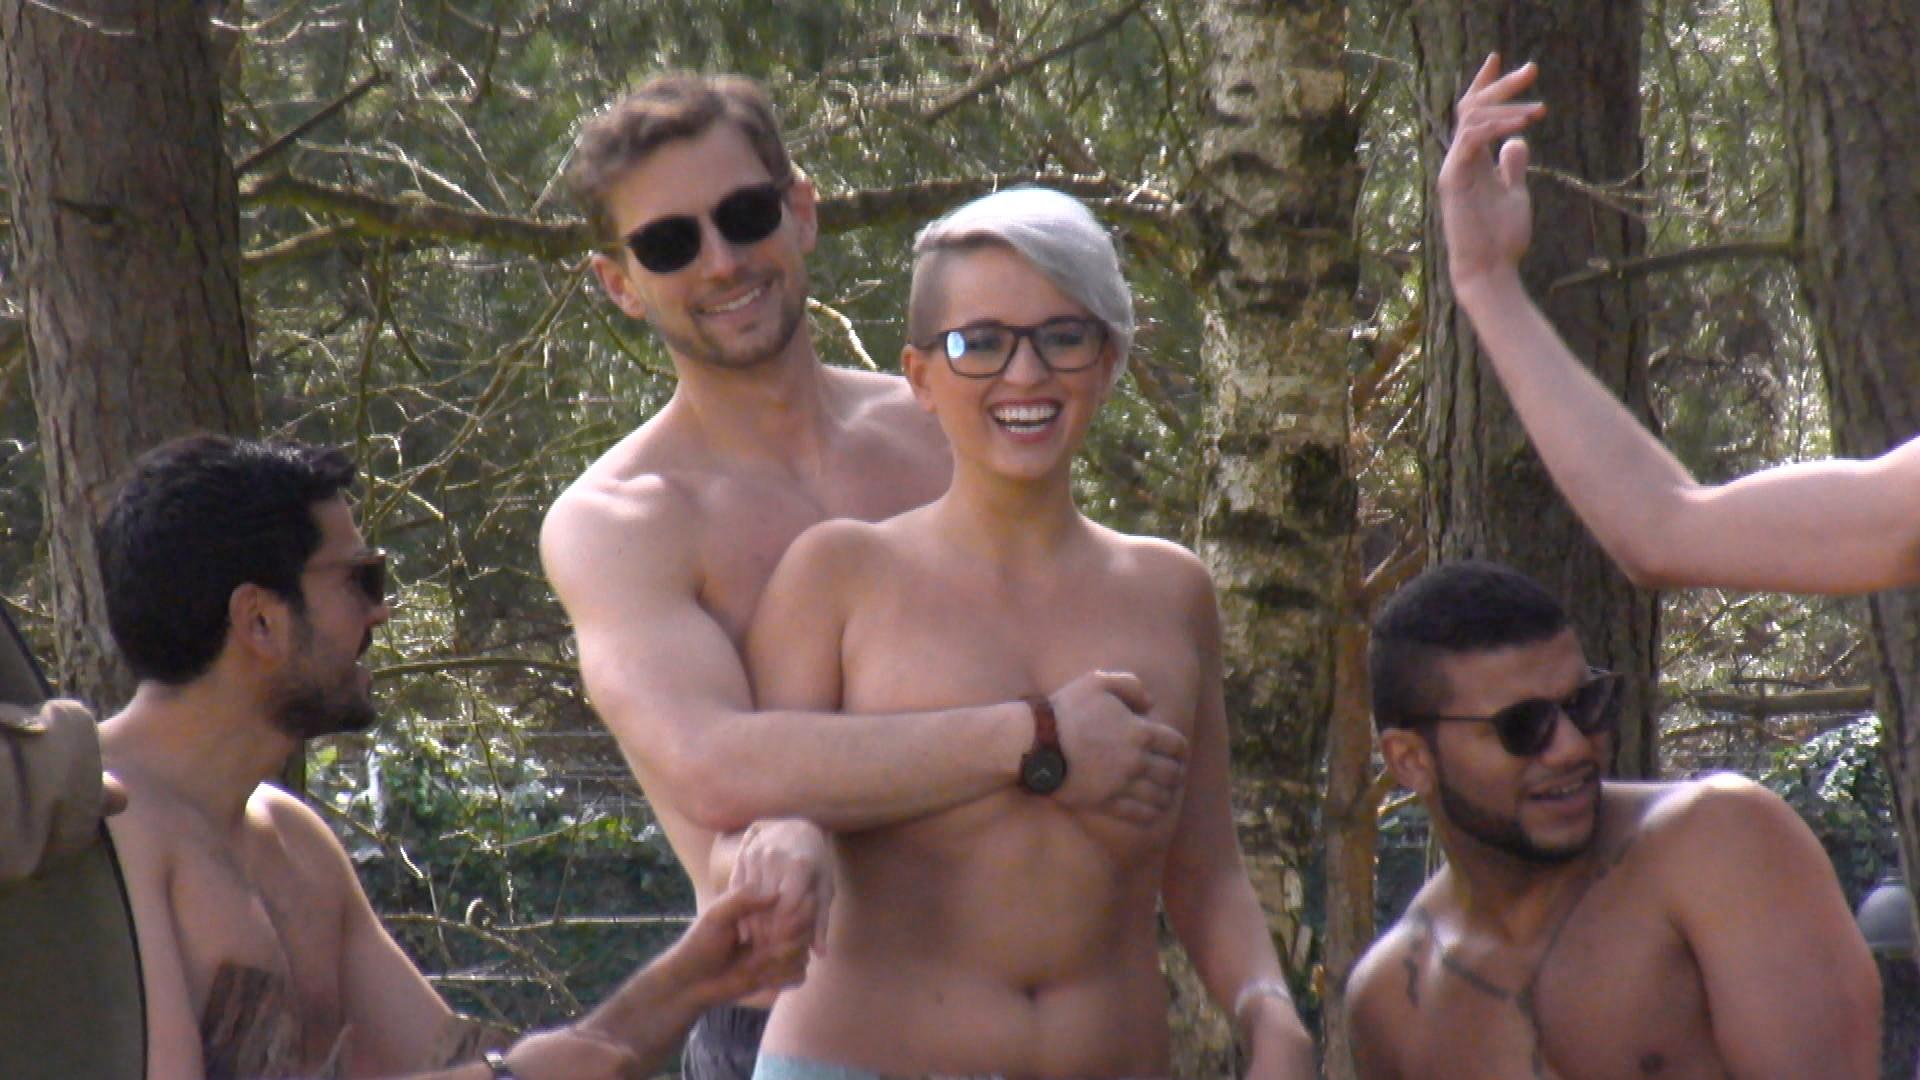 Newtopia Nackt Bilder Foto Shooting Folge 30 03.04.2015